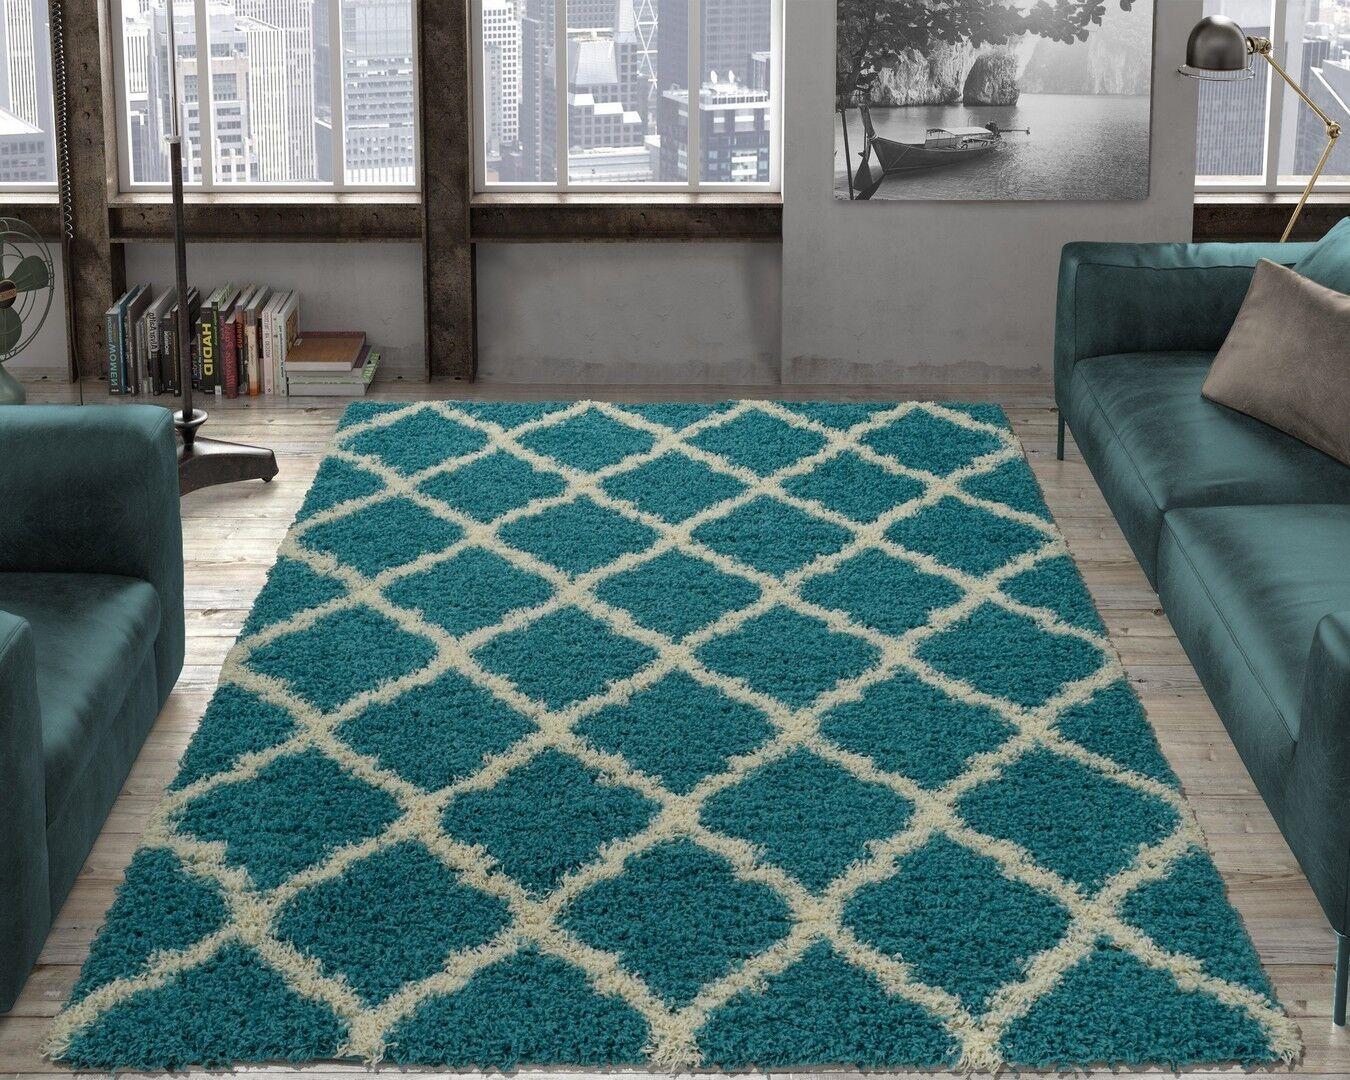 Designer 5' x 7' Ottomanson Moroccan Trellis Shag RugTurqu